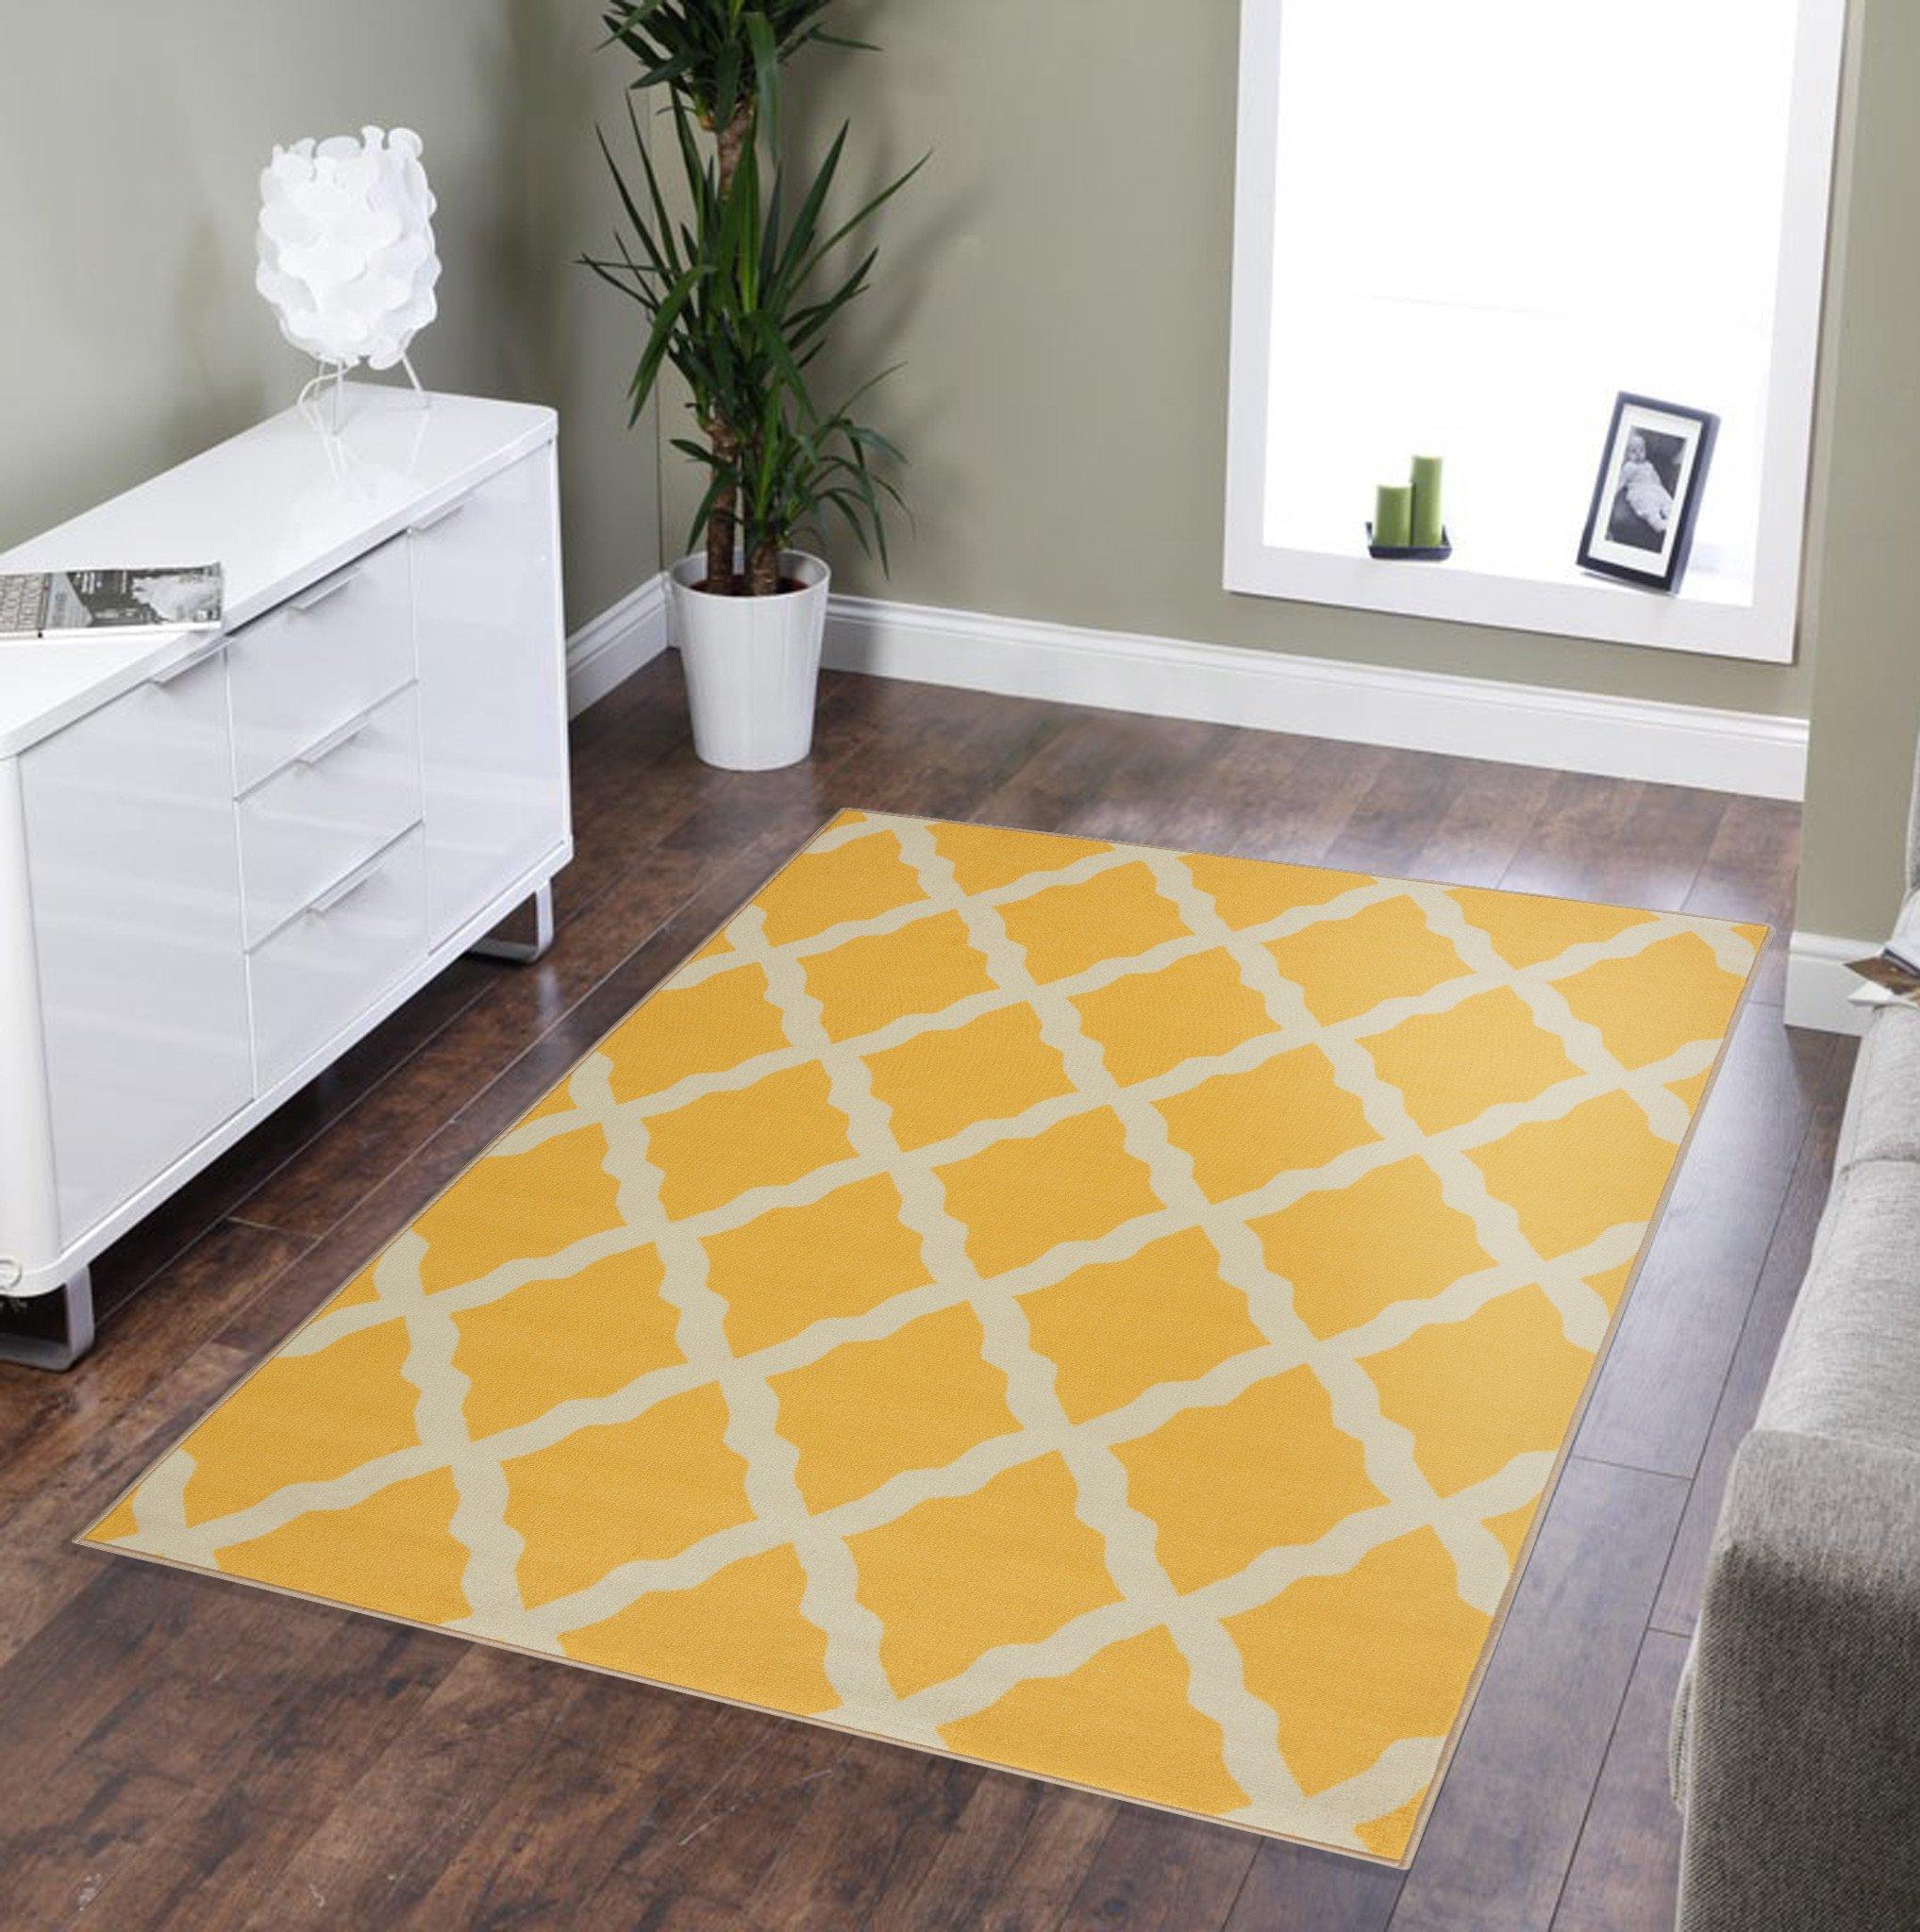 Sweethome Stores Clifton Collection Yellow Moroccan Trellis Design 5' X 6'6 Area Rug